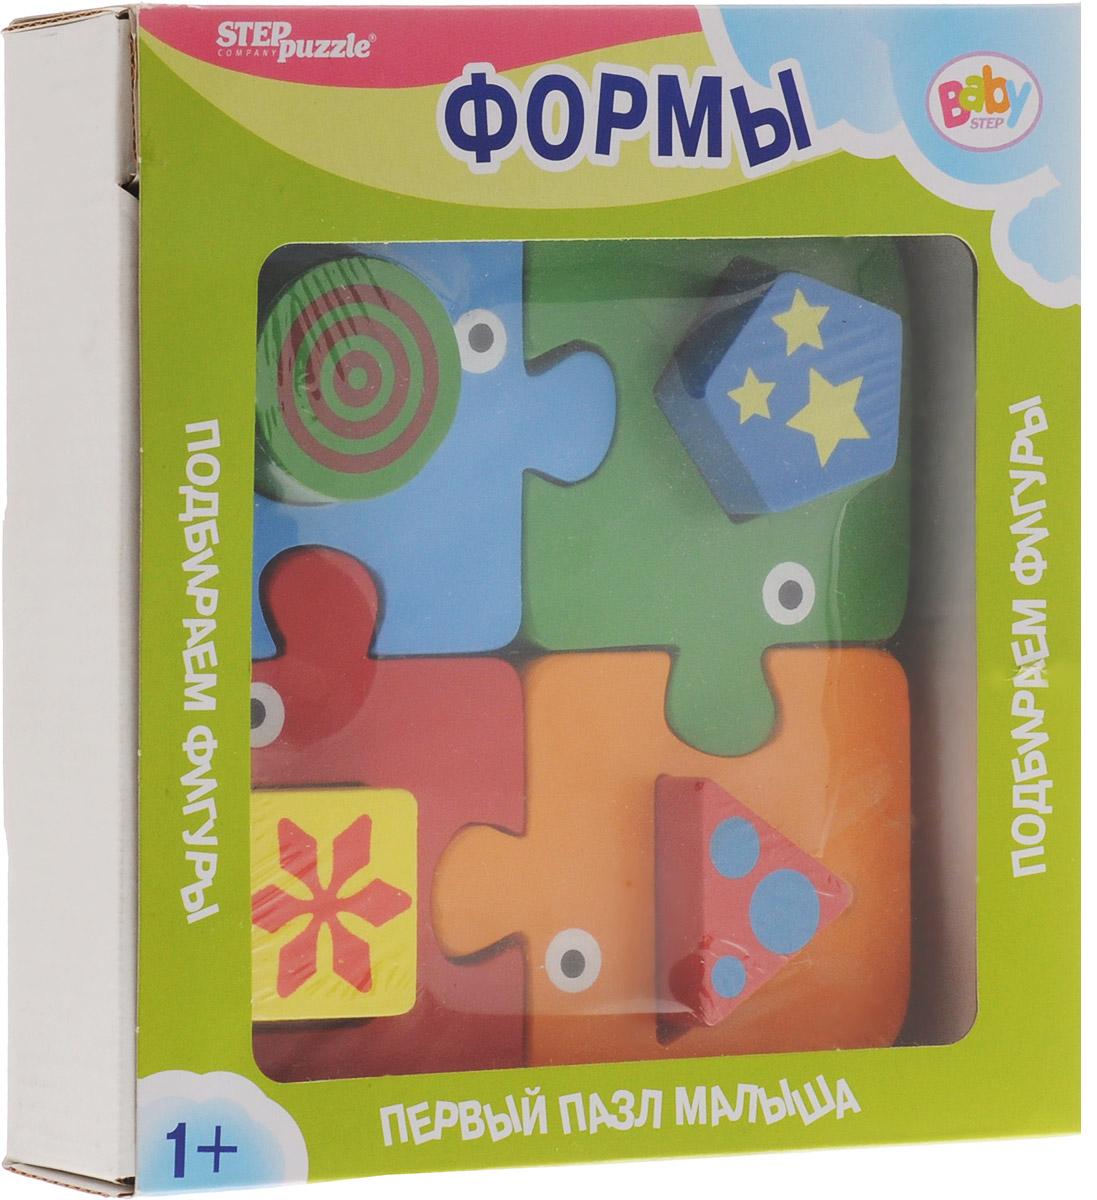 Step Puzzle Пазл для малышей Формы